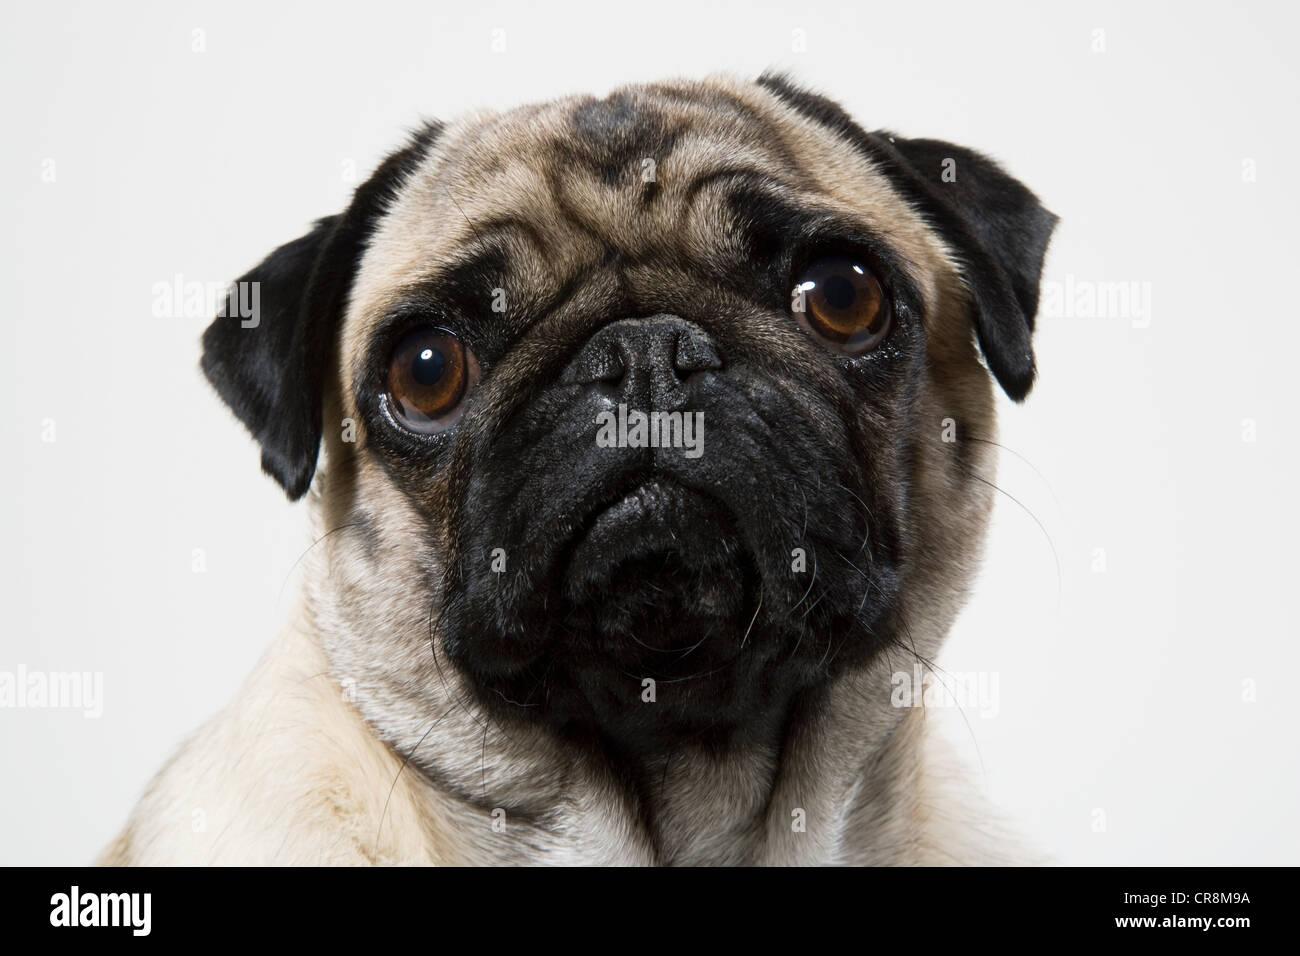 Pug dog close up, portrait - Stock Image